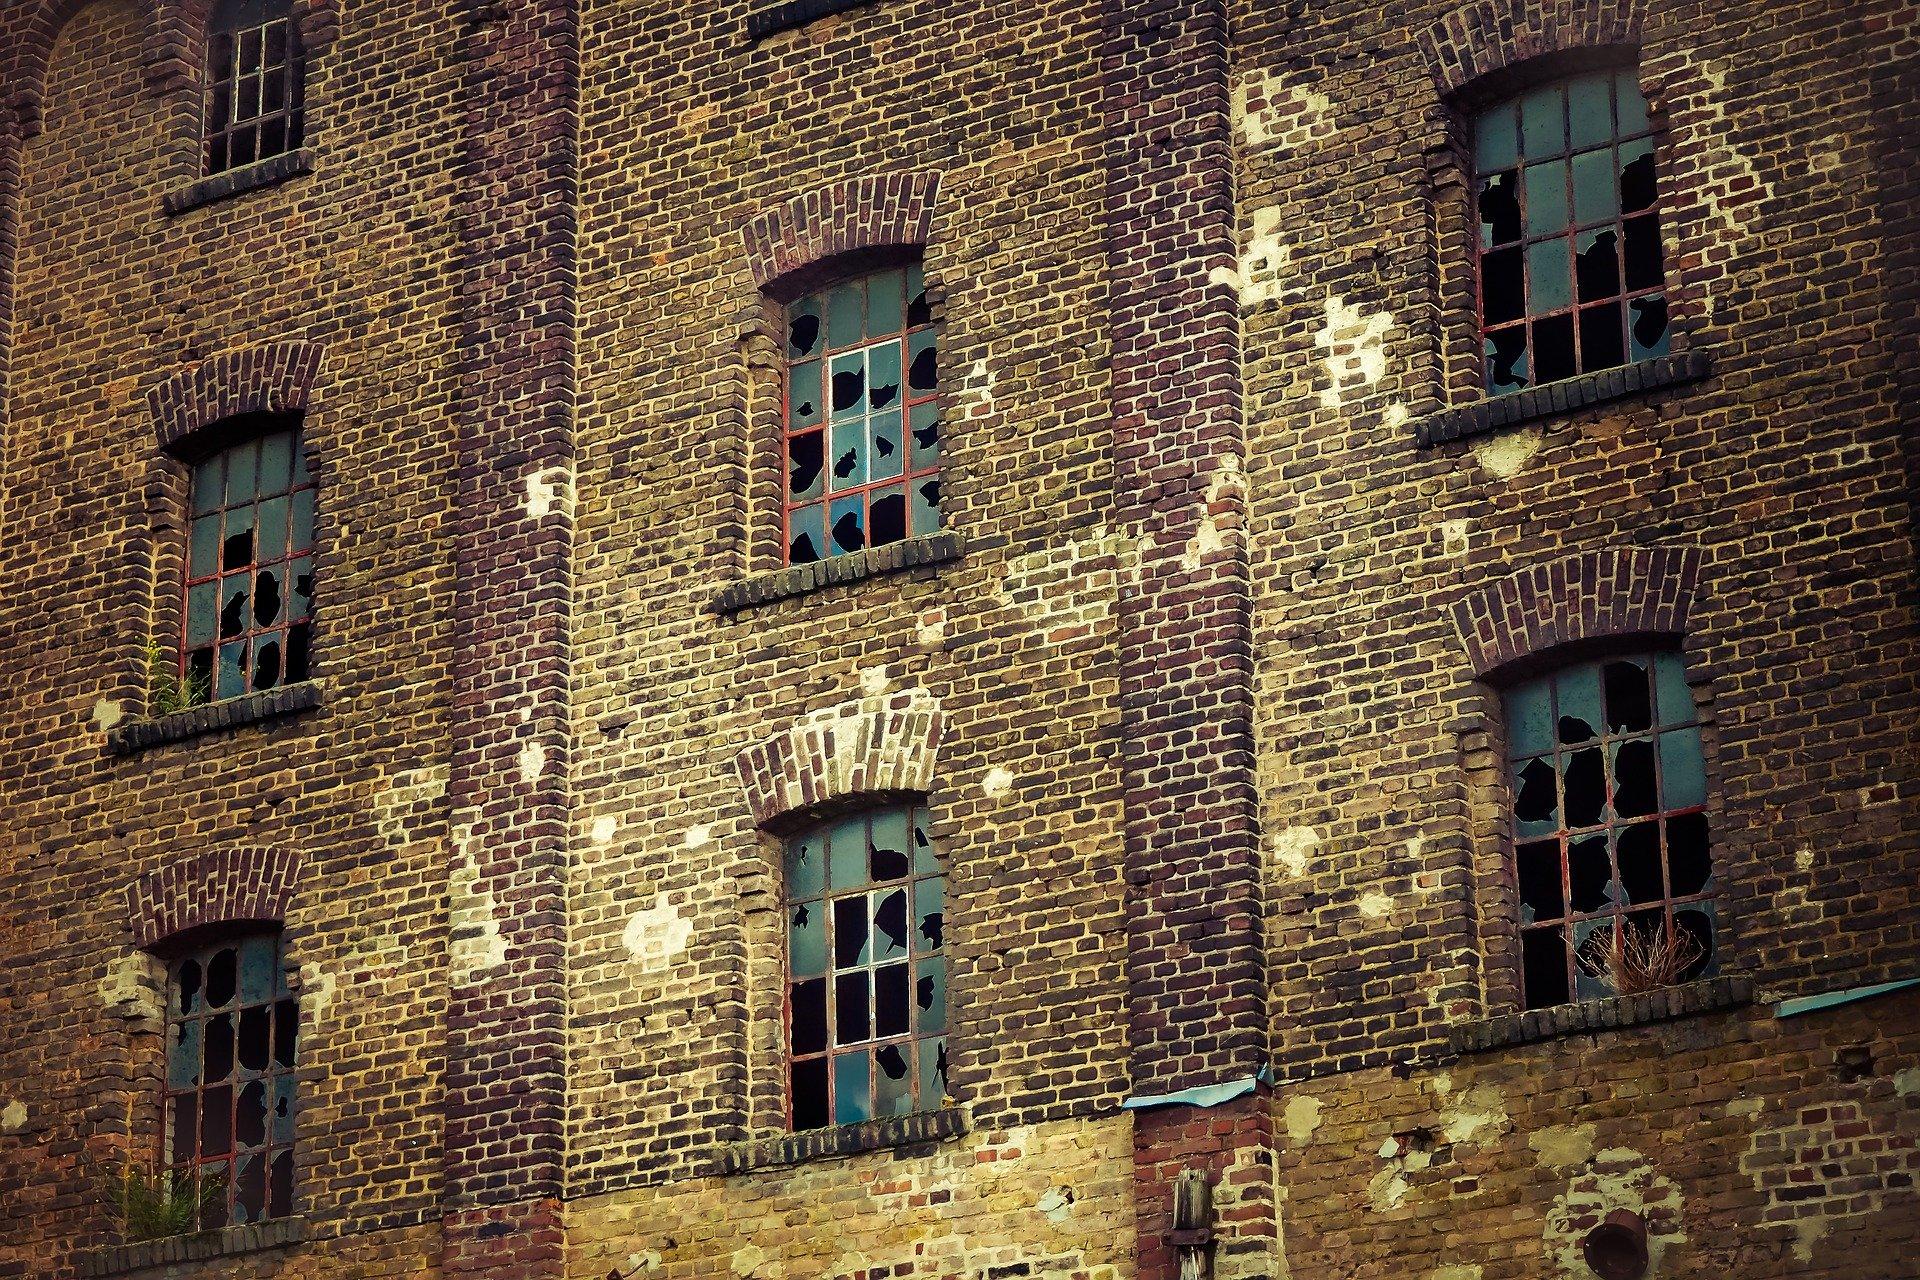 Edificio-ventanas-rotas